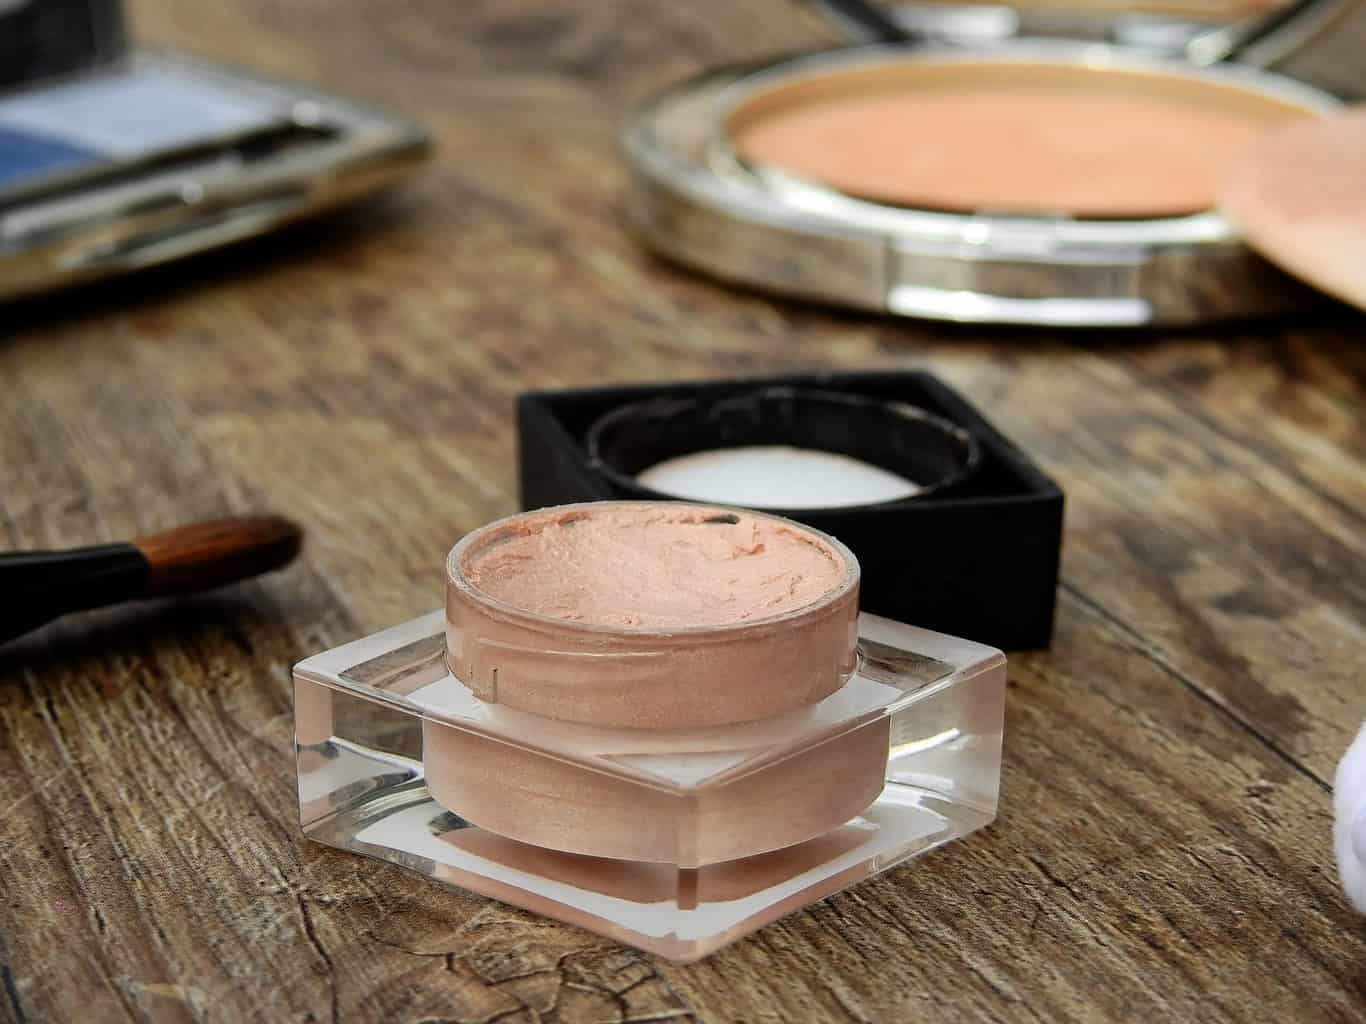 druhy makeupů